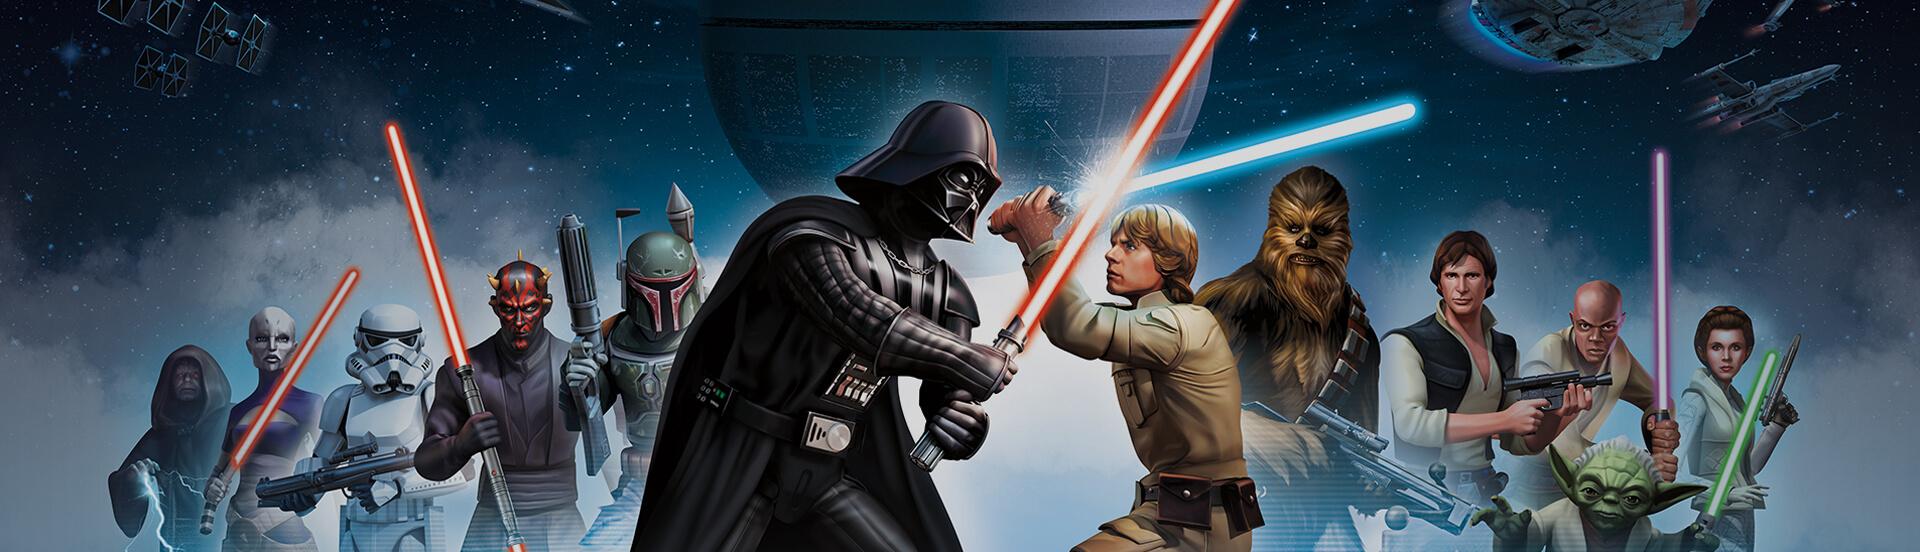 Star Wars #20